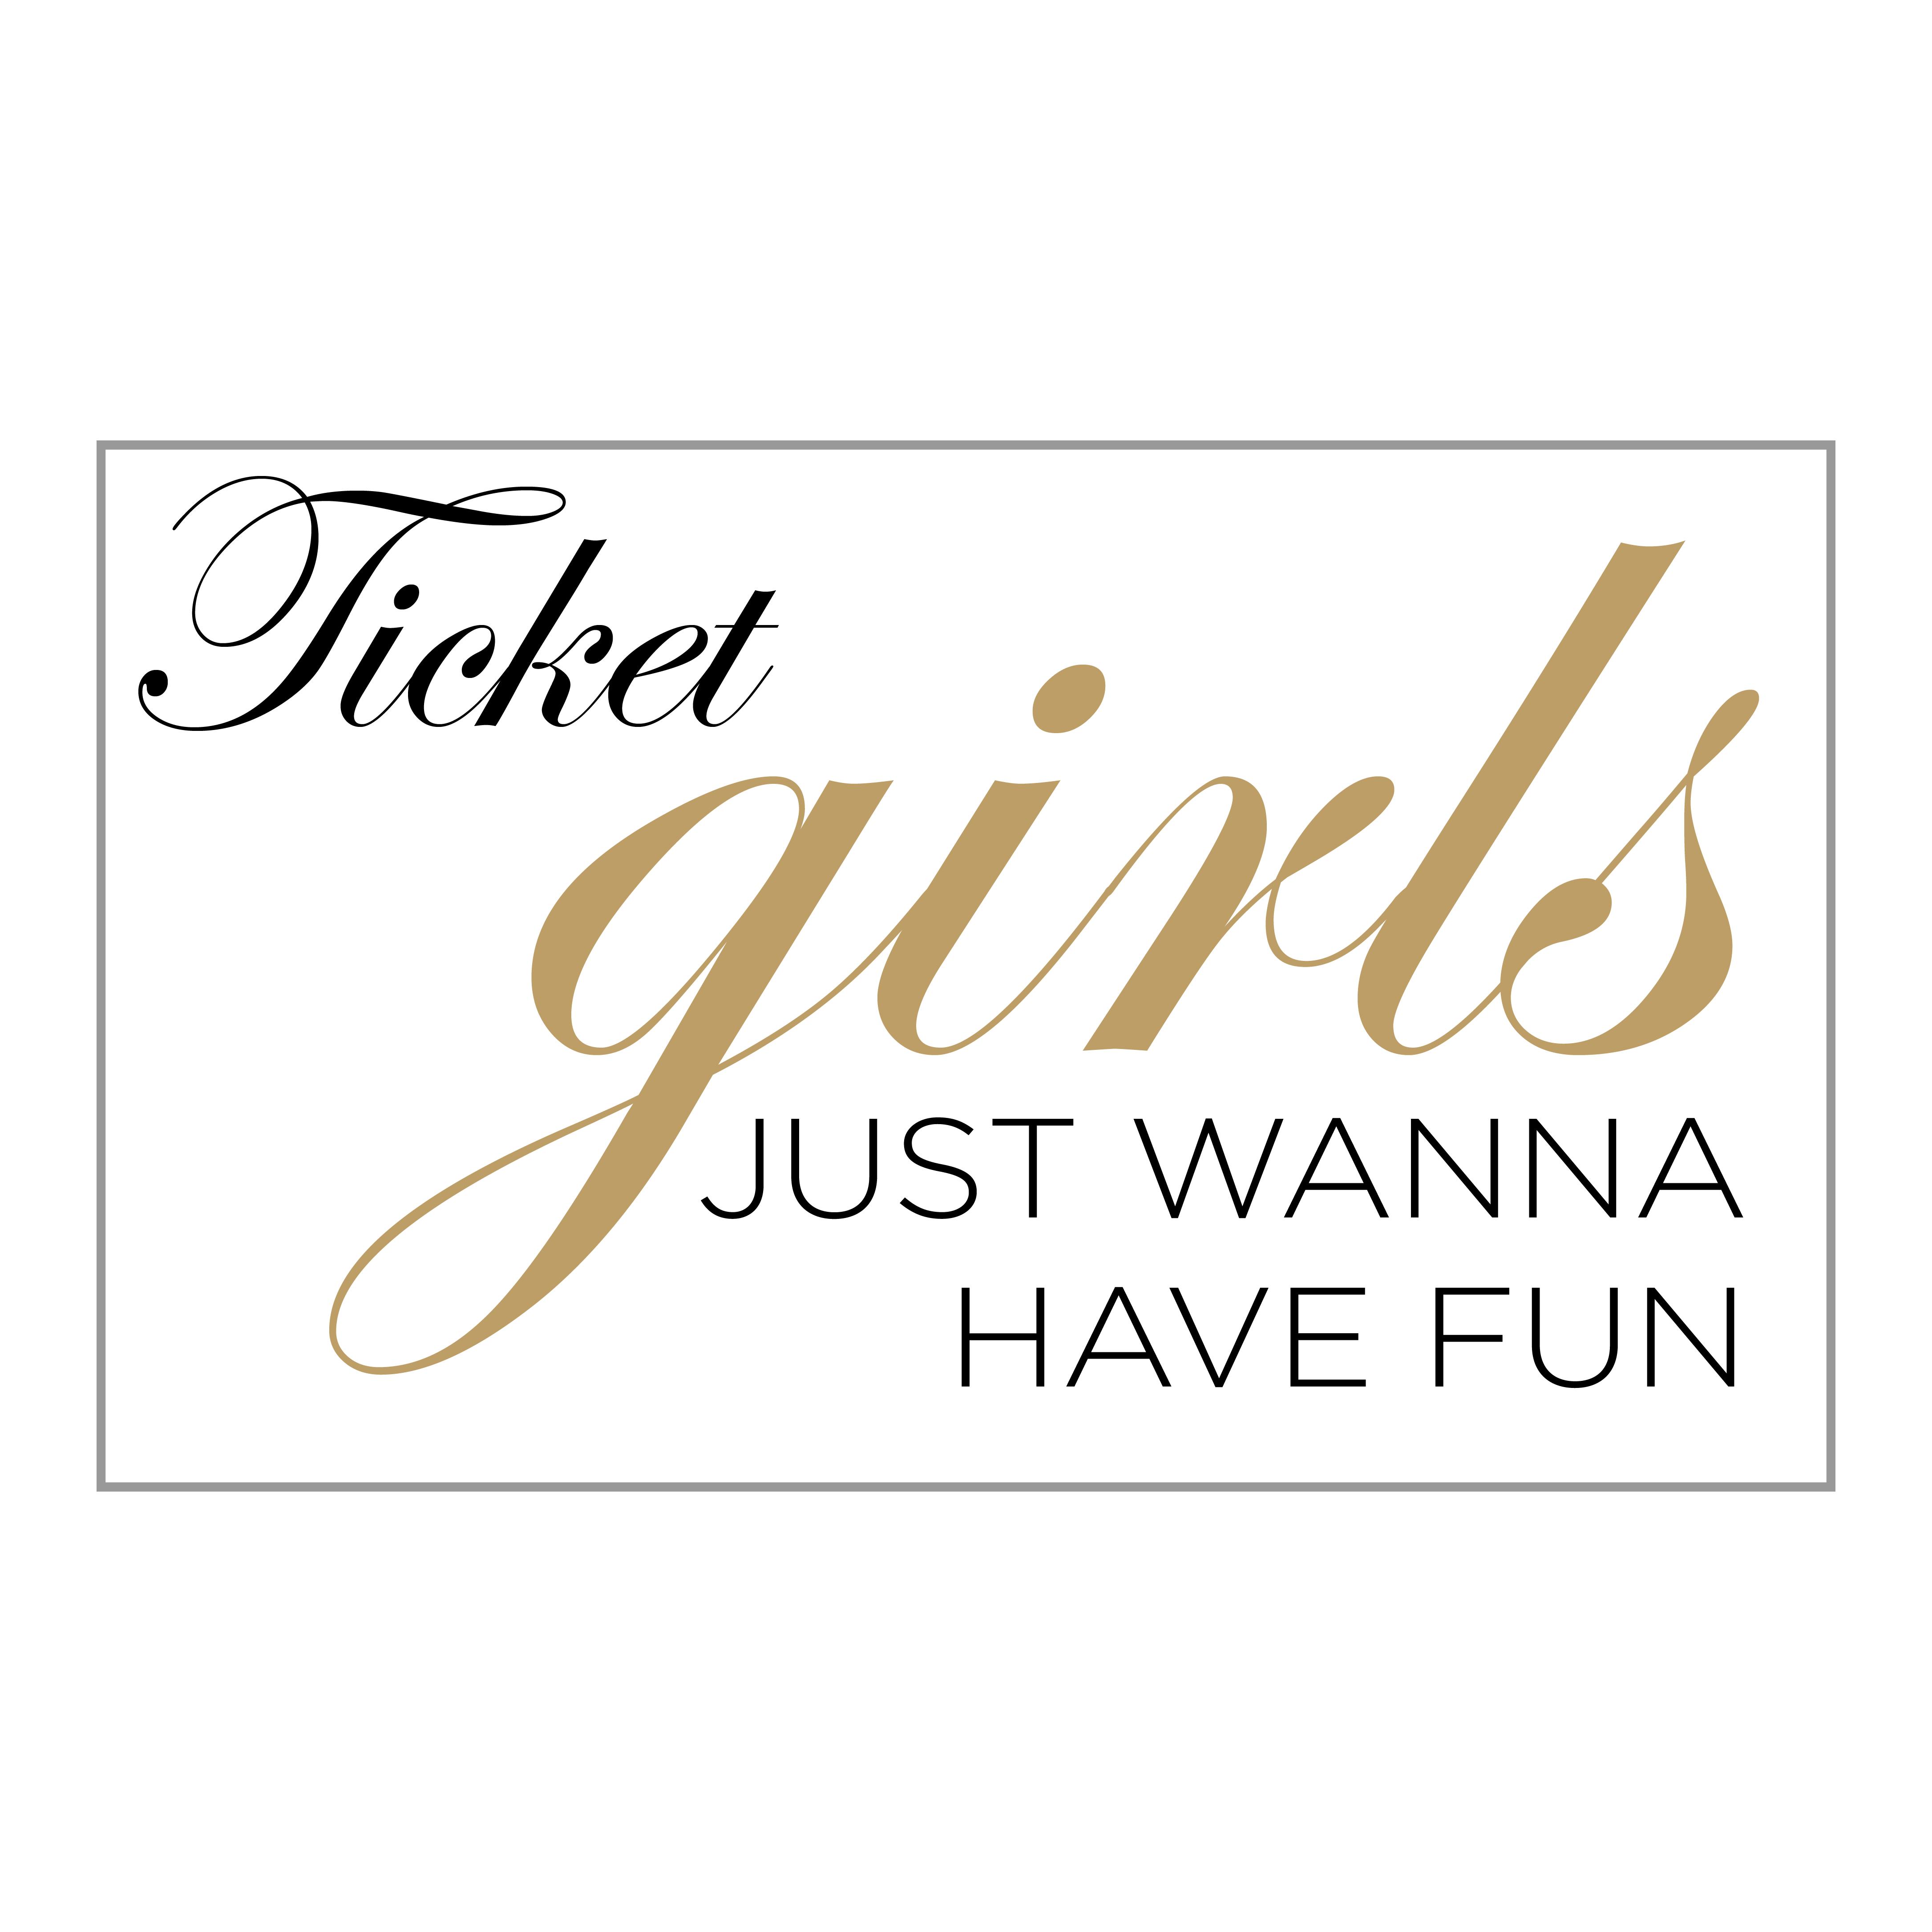 0f9568b325 Girls Just Wanna Have Fun Ticket – Ronald McDonald House Mobile